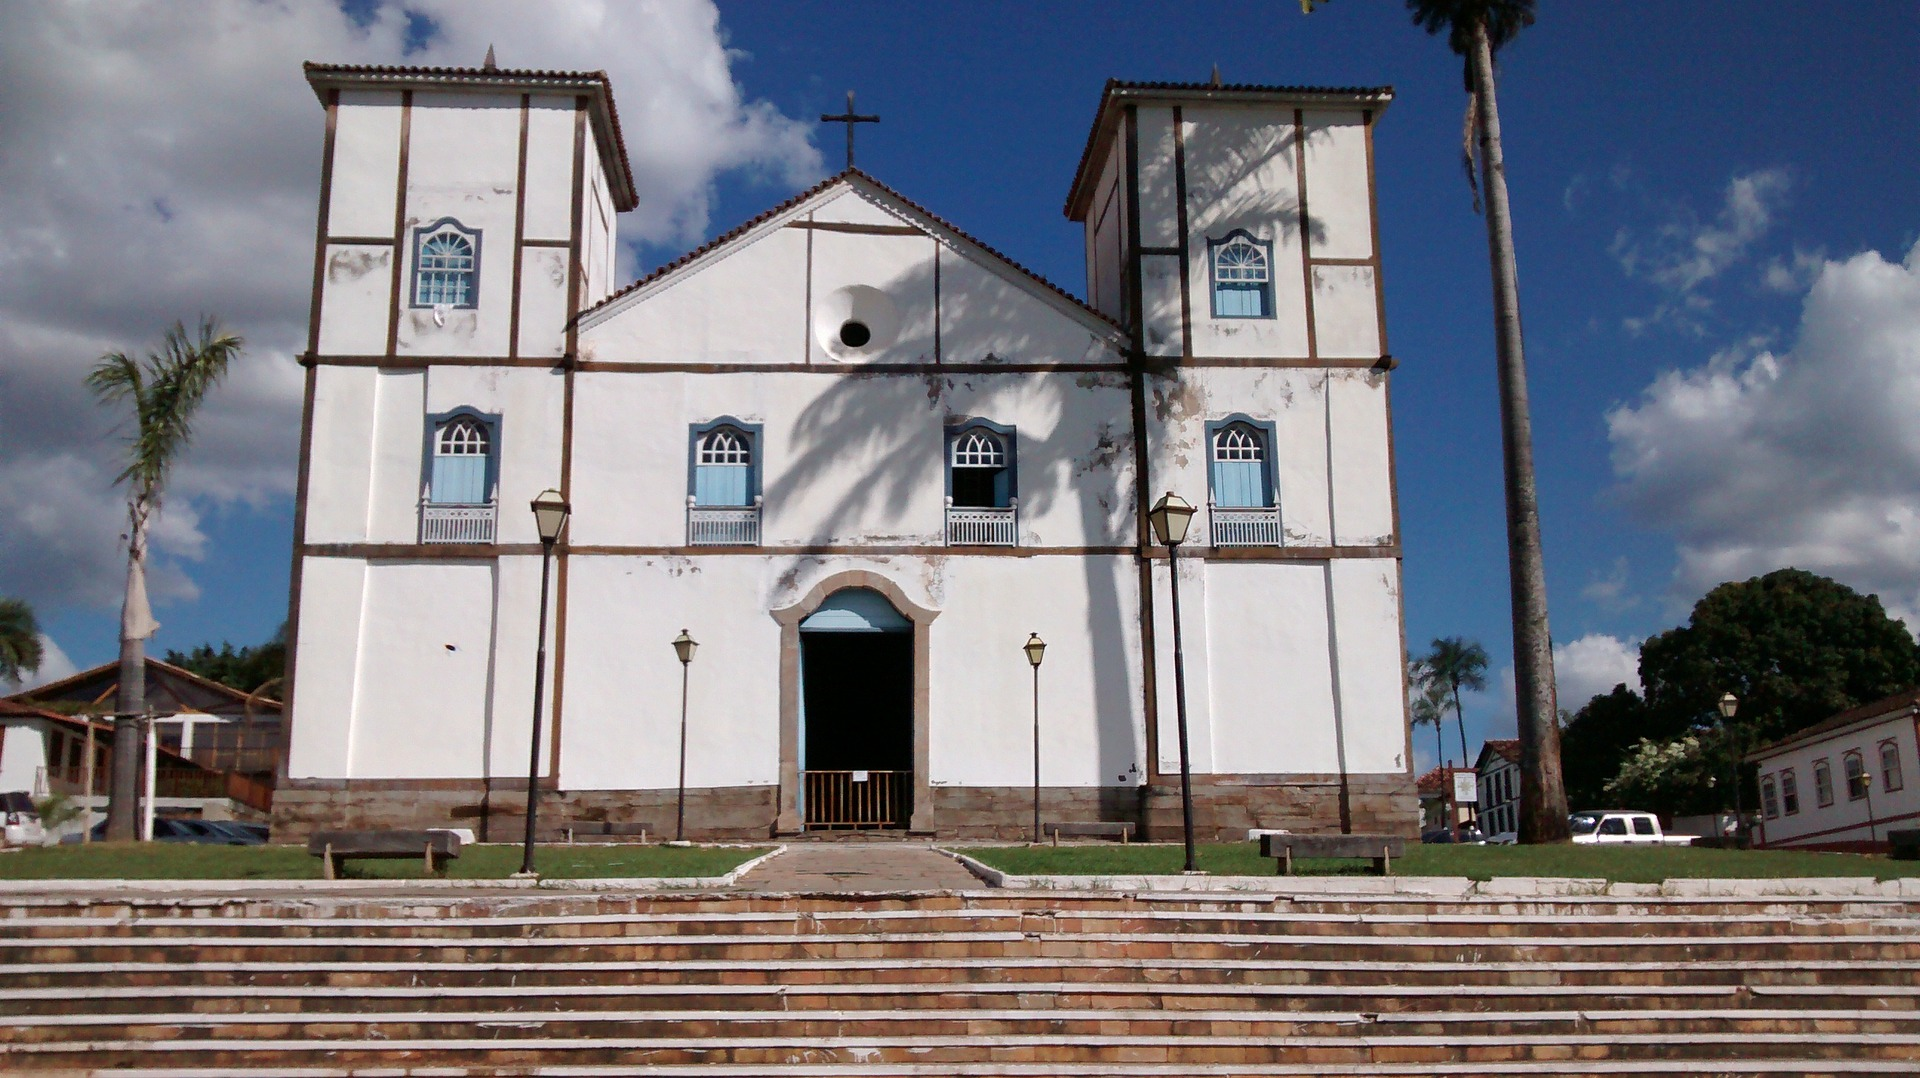 Niquelândia - Goiás